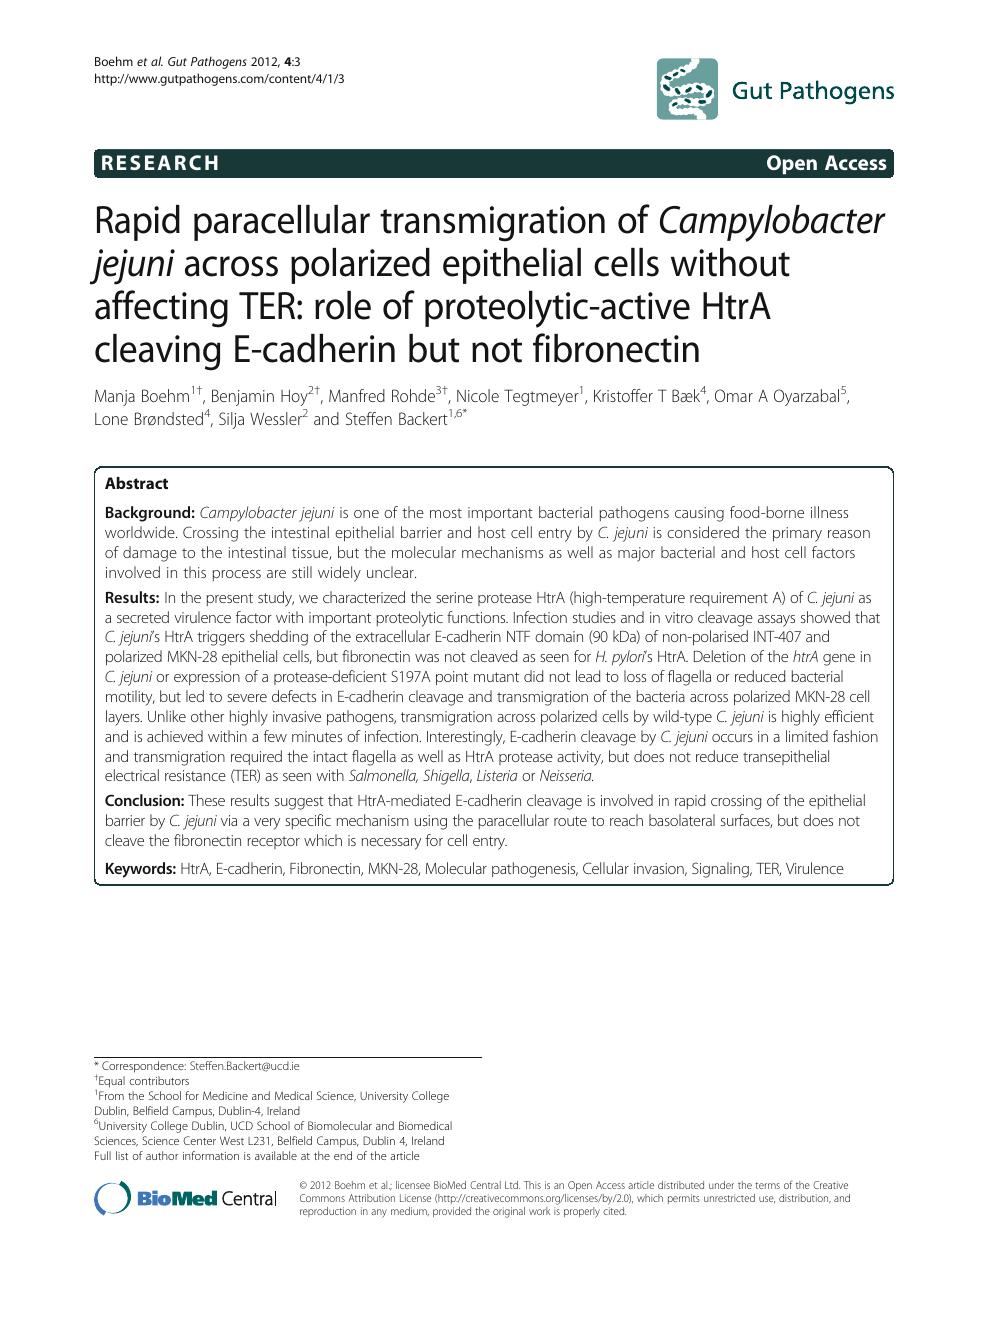 Rapid paracellular transmigration of Campylobacter jejuni across